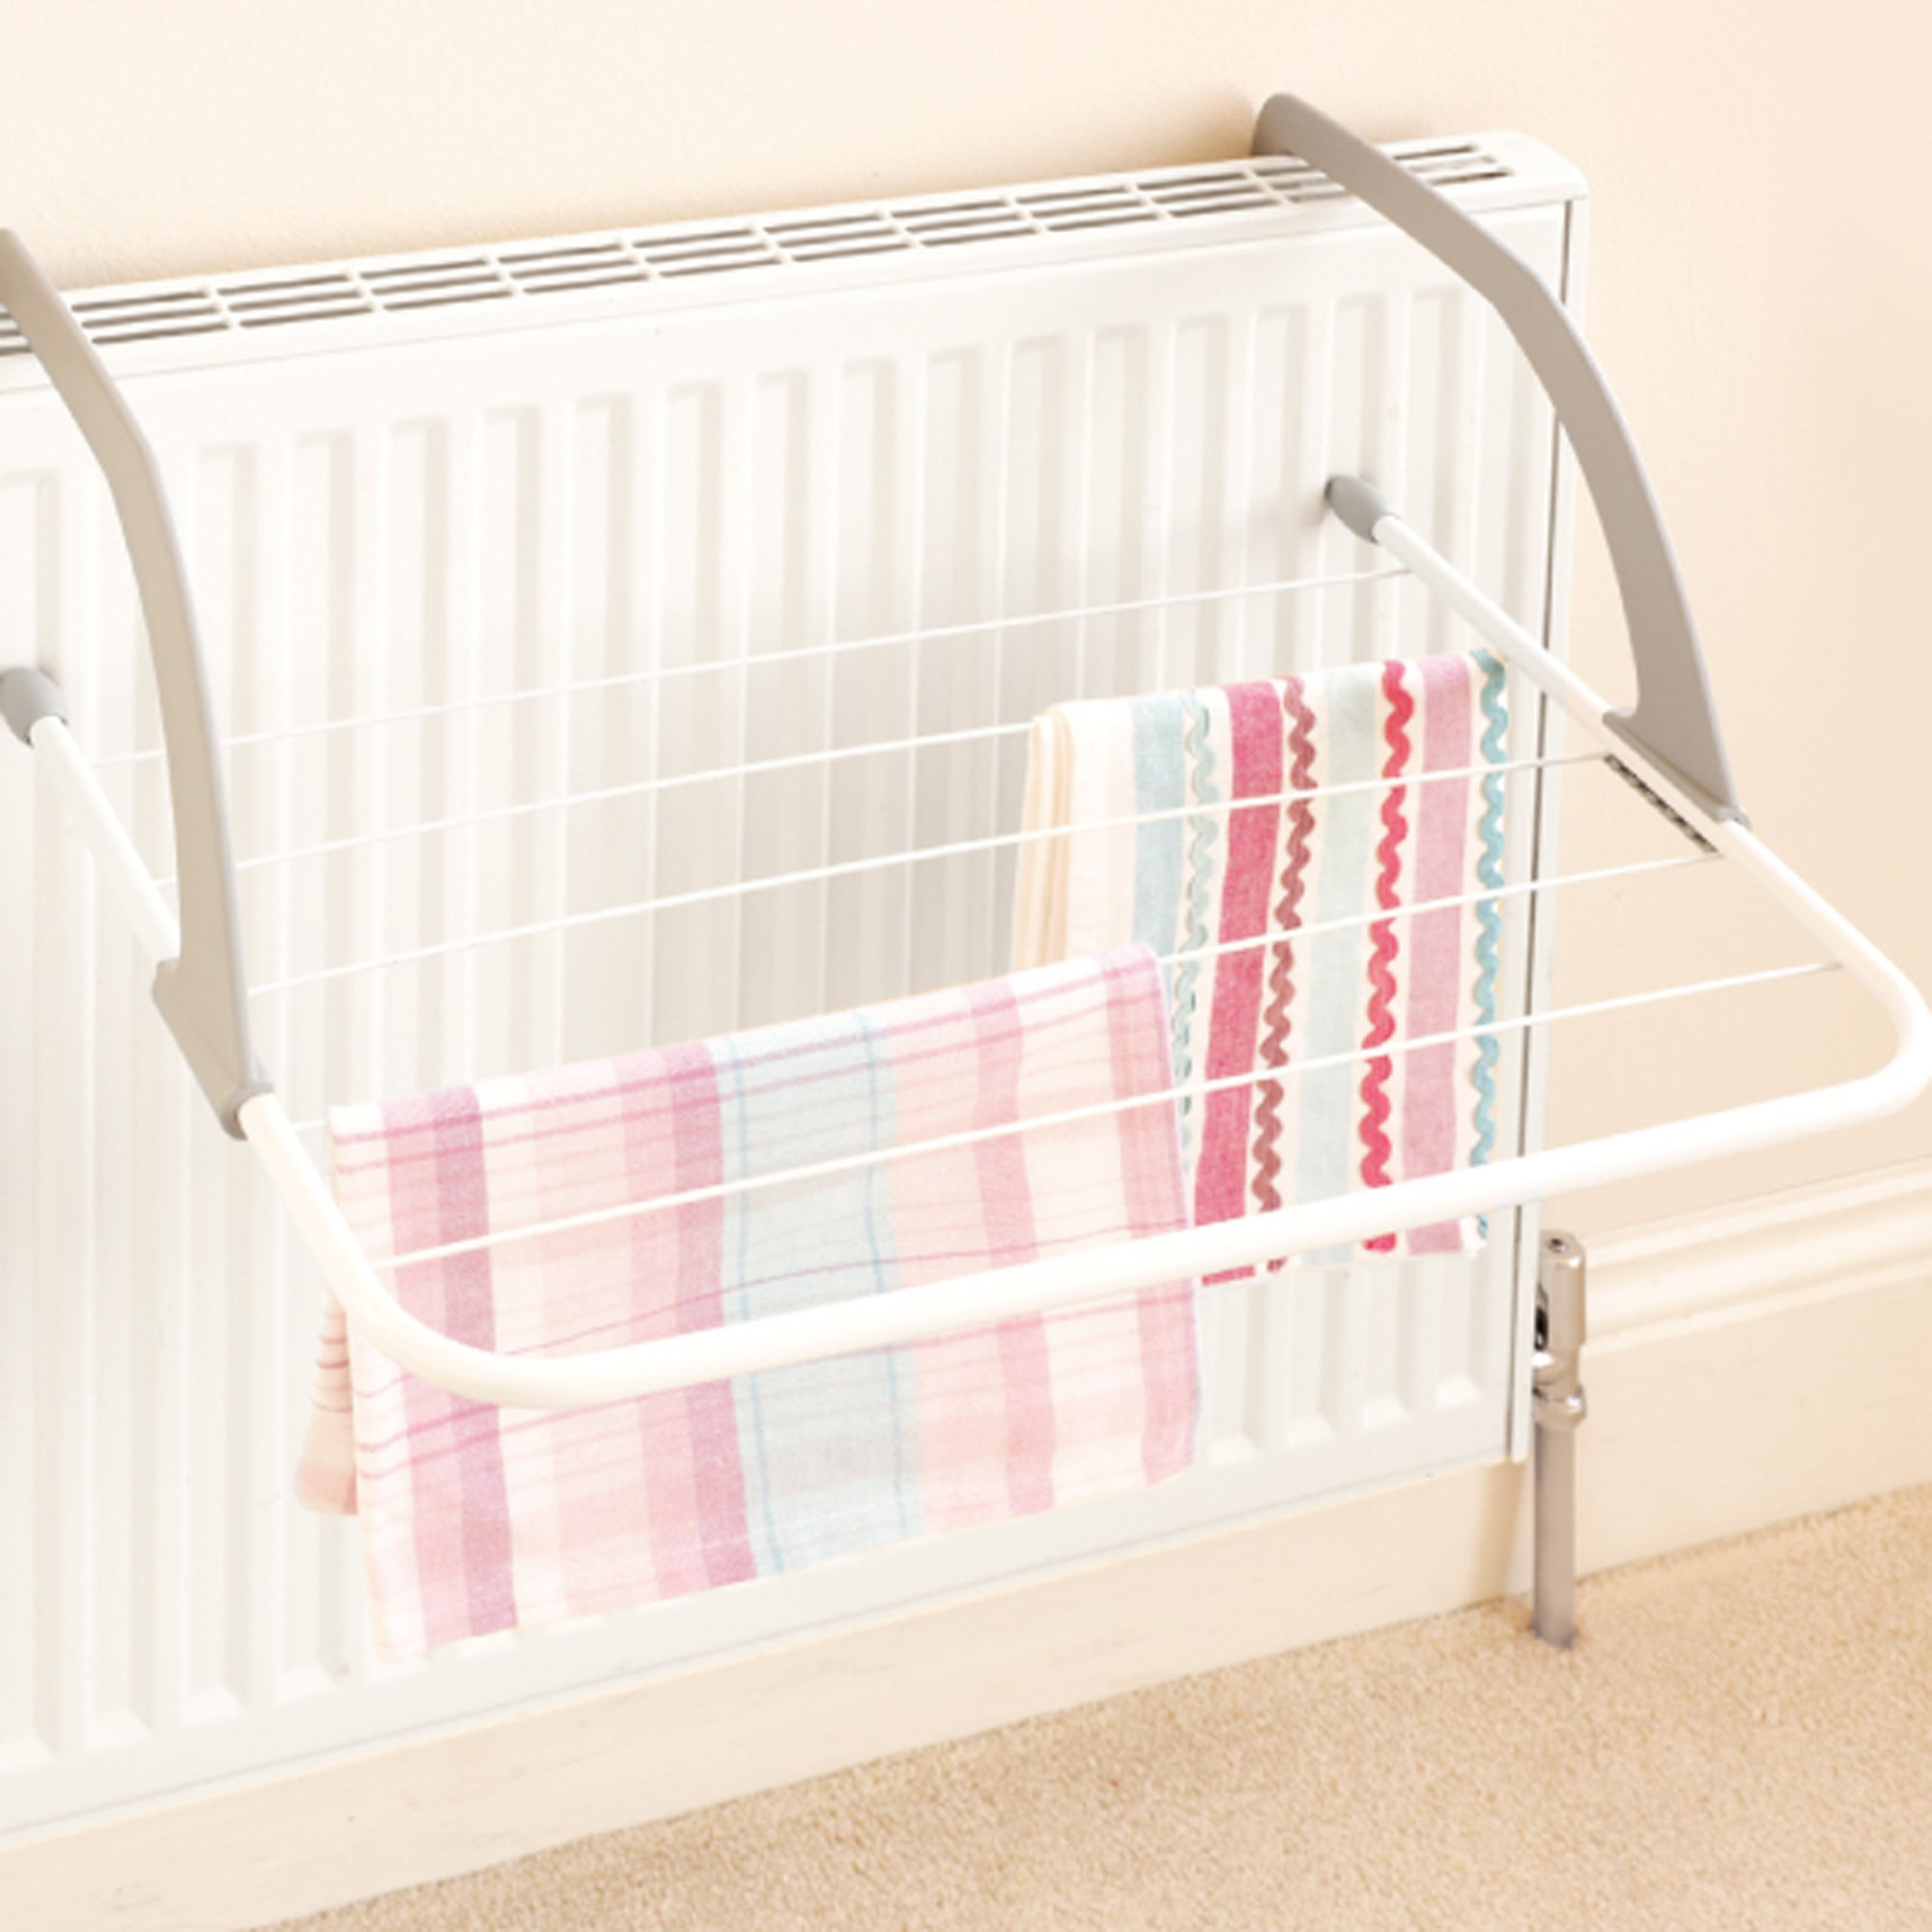 white 5 bar radiator airer dunelm. Black Bedroom Furniture Sets. Home Design Ideas